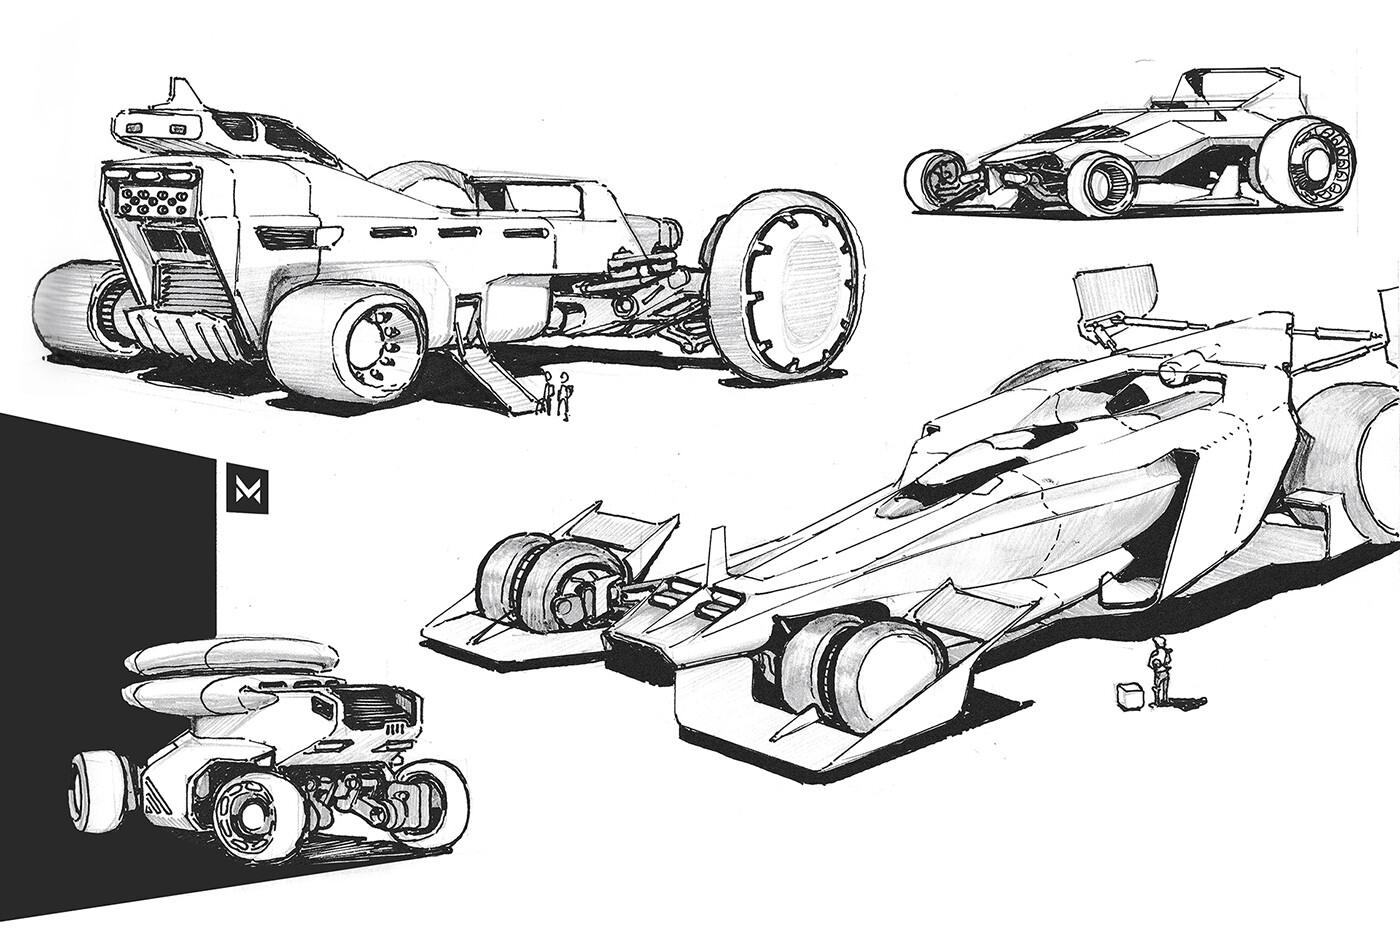 XL racing machines